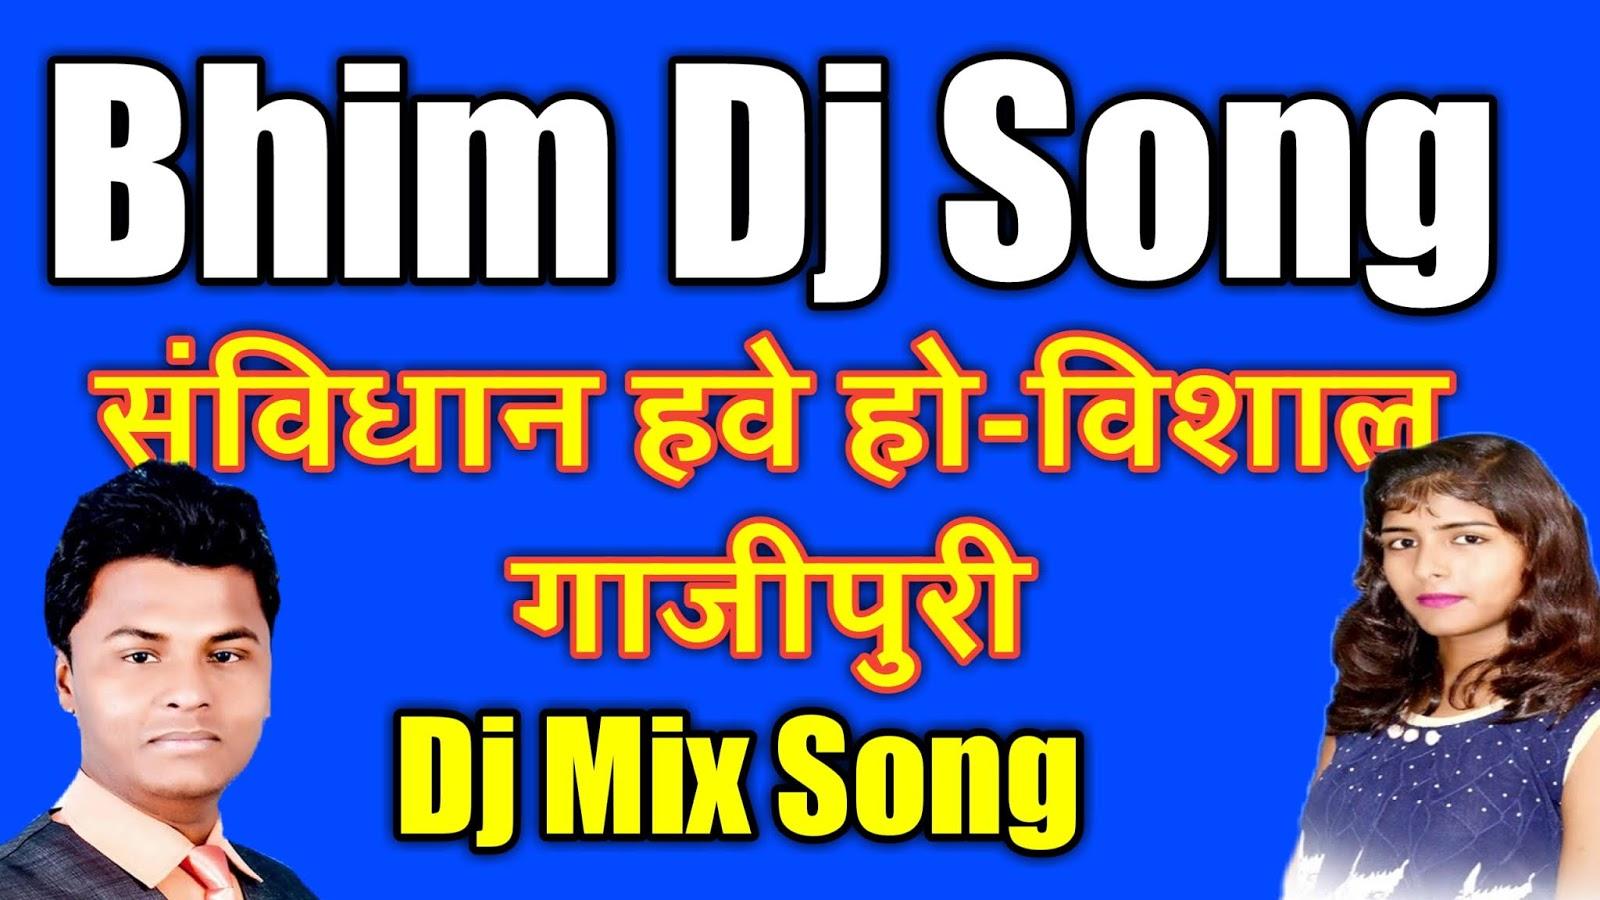 new bhim song dj remix 2019 download